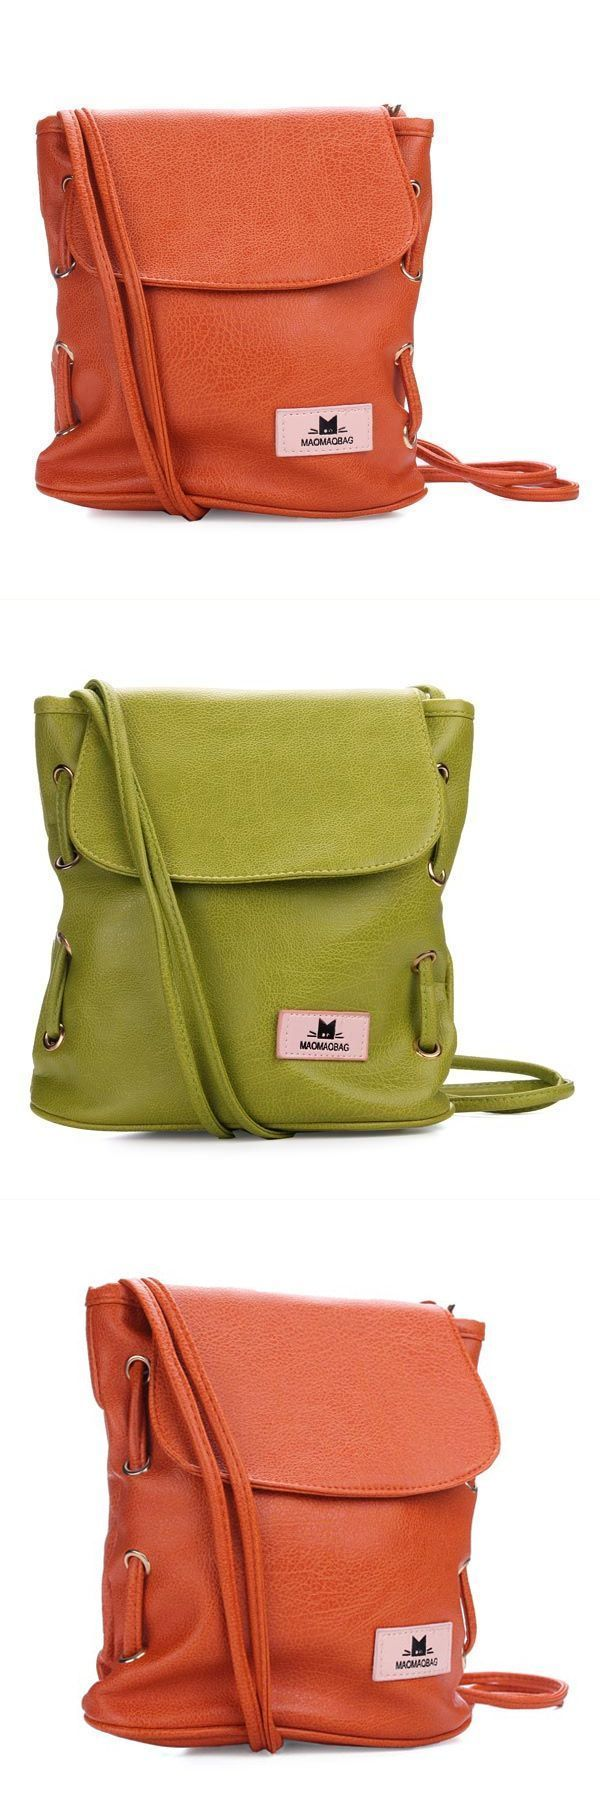 Fashion vintage candy color bucket bag shoulder cross body bag crossbody bags #9 #crossbody #bag #crossbody #bags #aldo #crossbody #bags #made #in #usa #crossbody #bags #primark